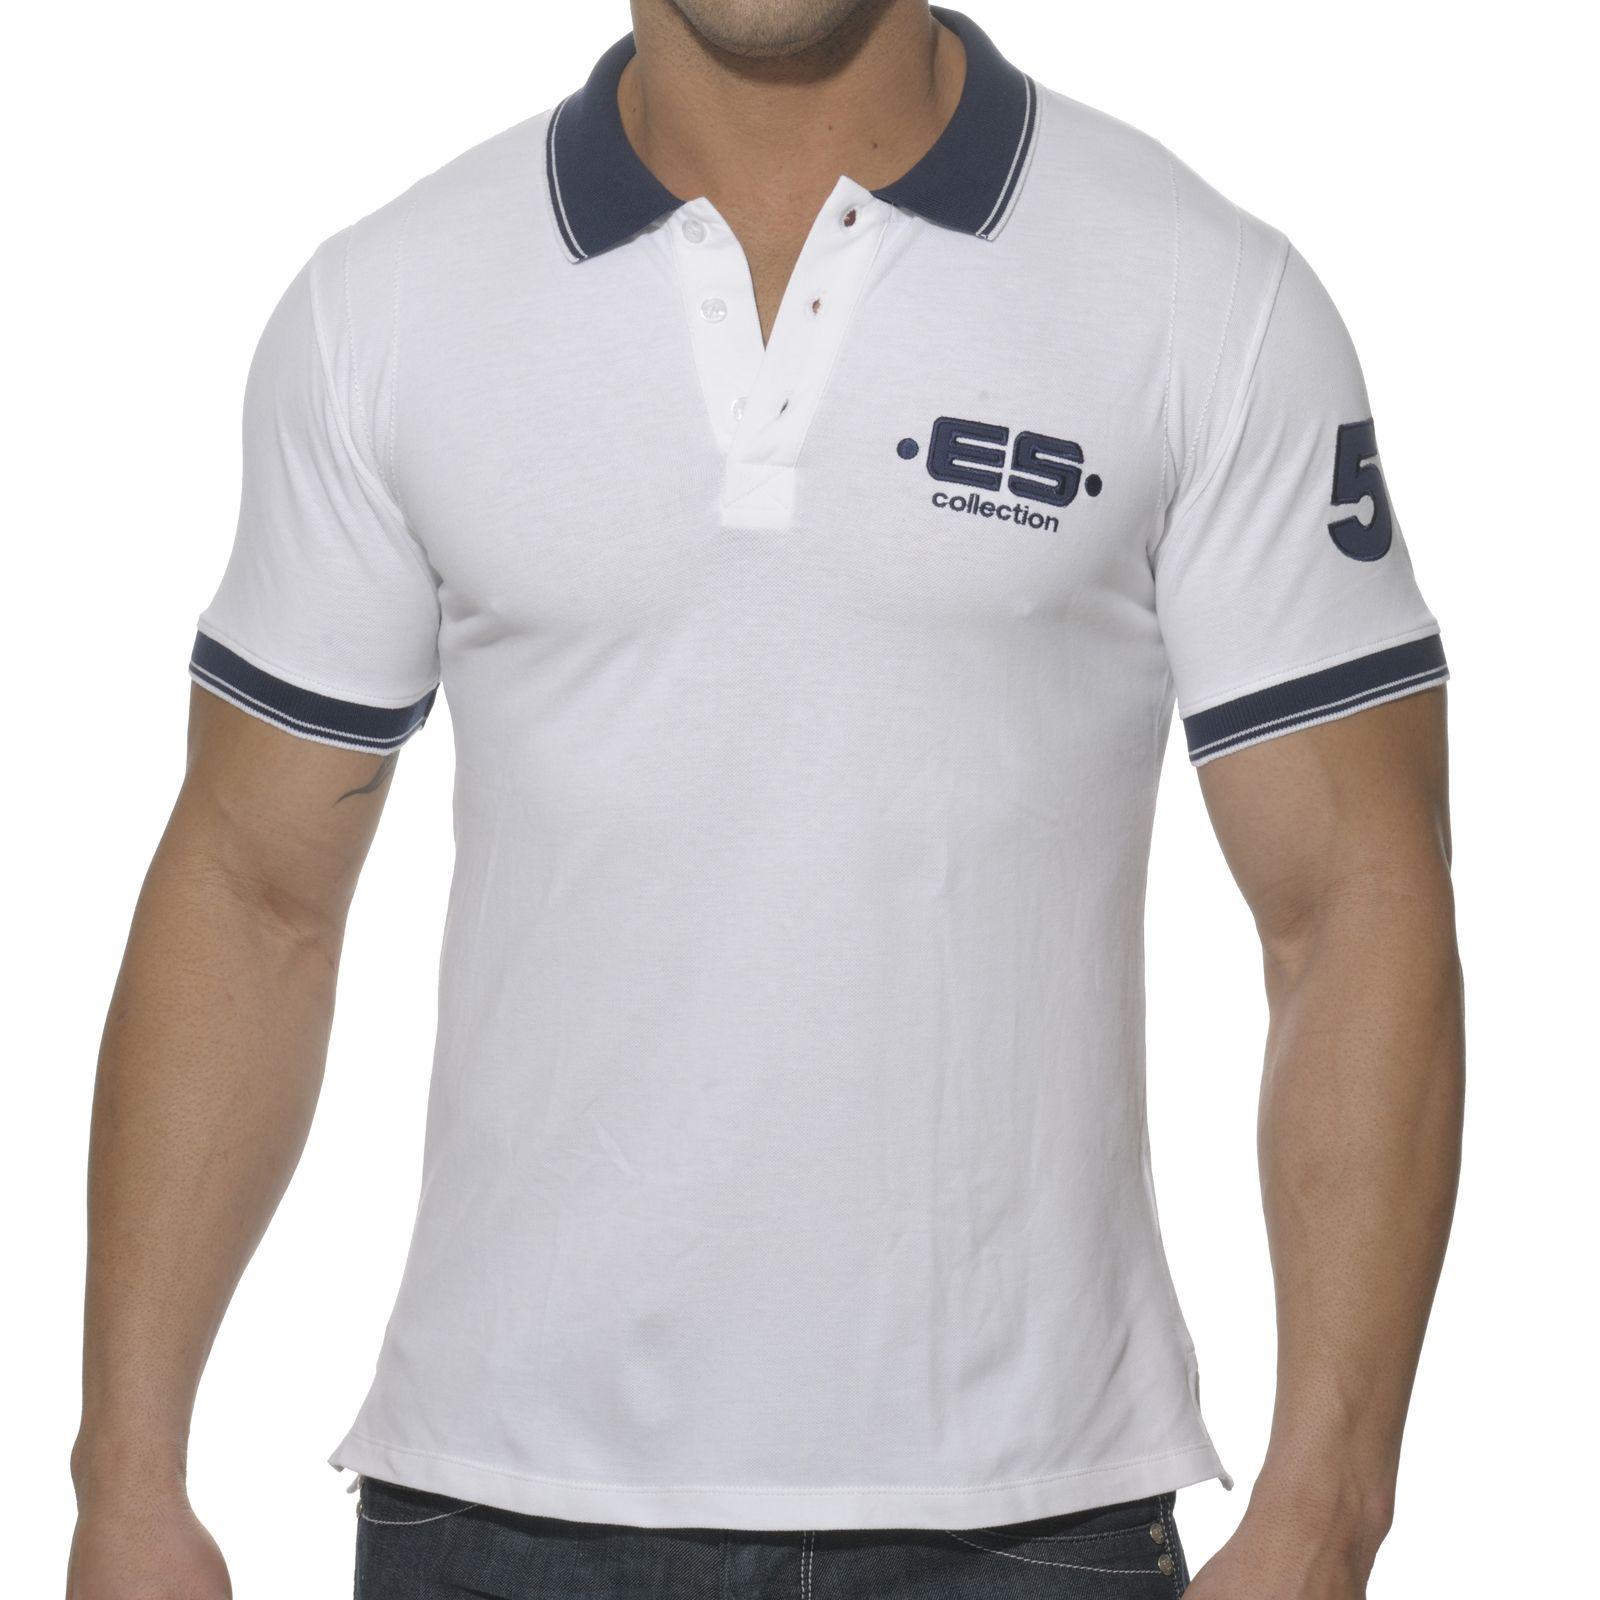 V neck t shirt addicted ad214 for Polo shirt girl addiction